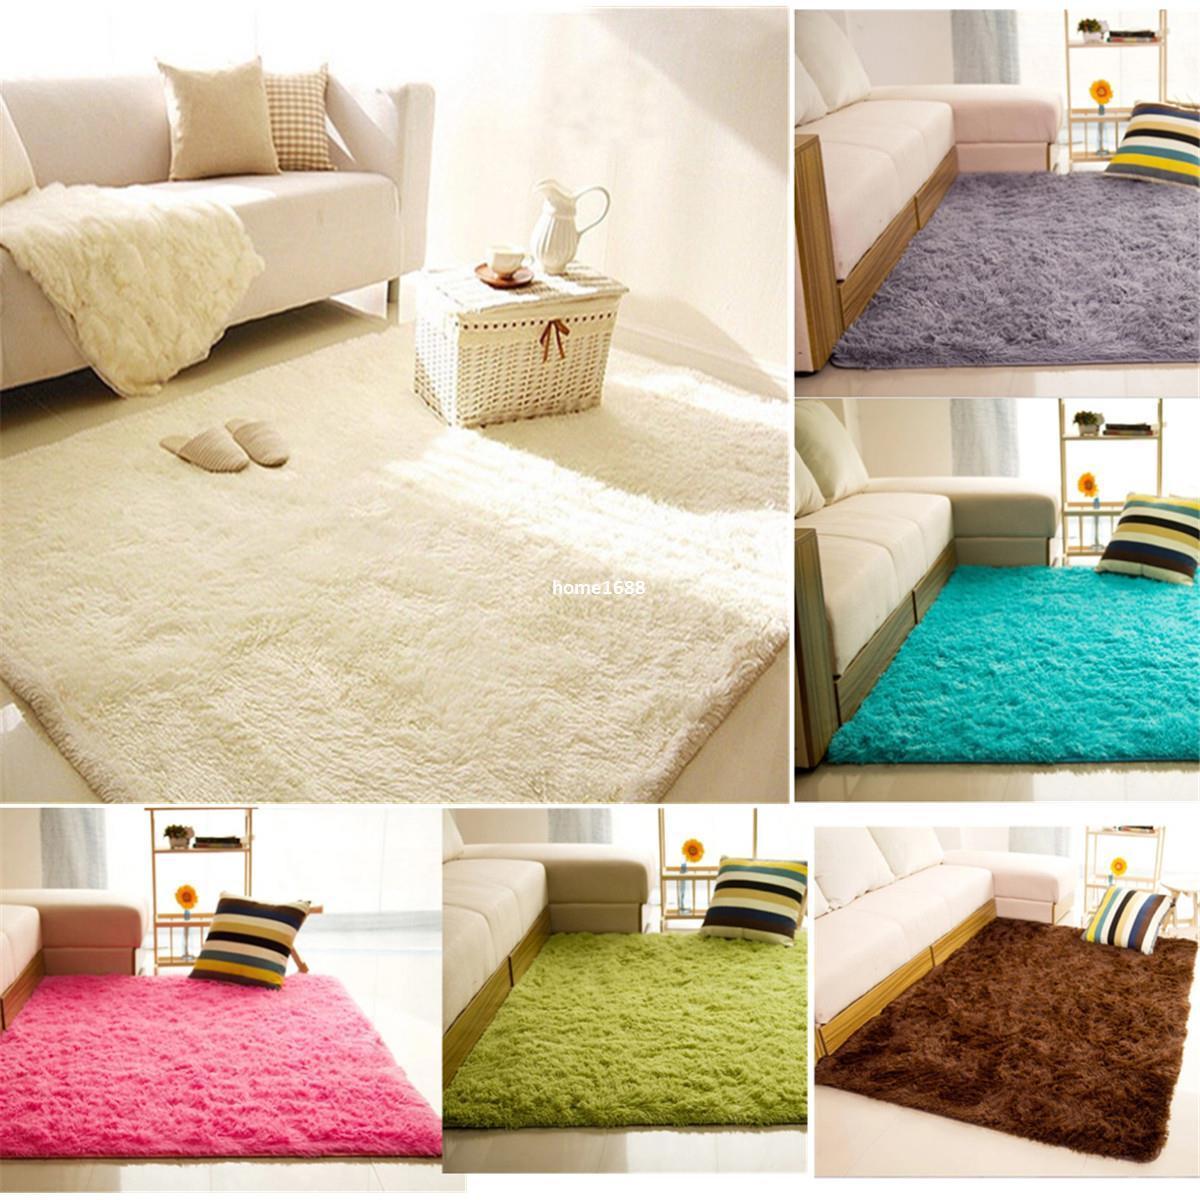 Hot High Quality 80*120cm Living Room Bedroom Carpet Rug For Home ...